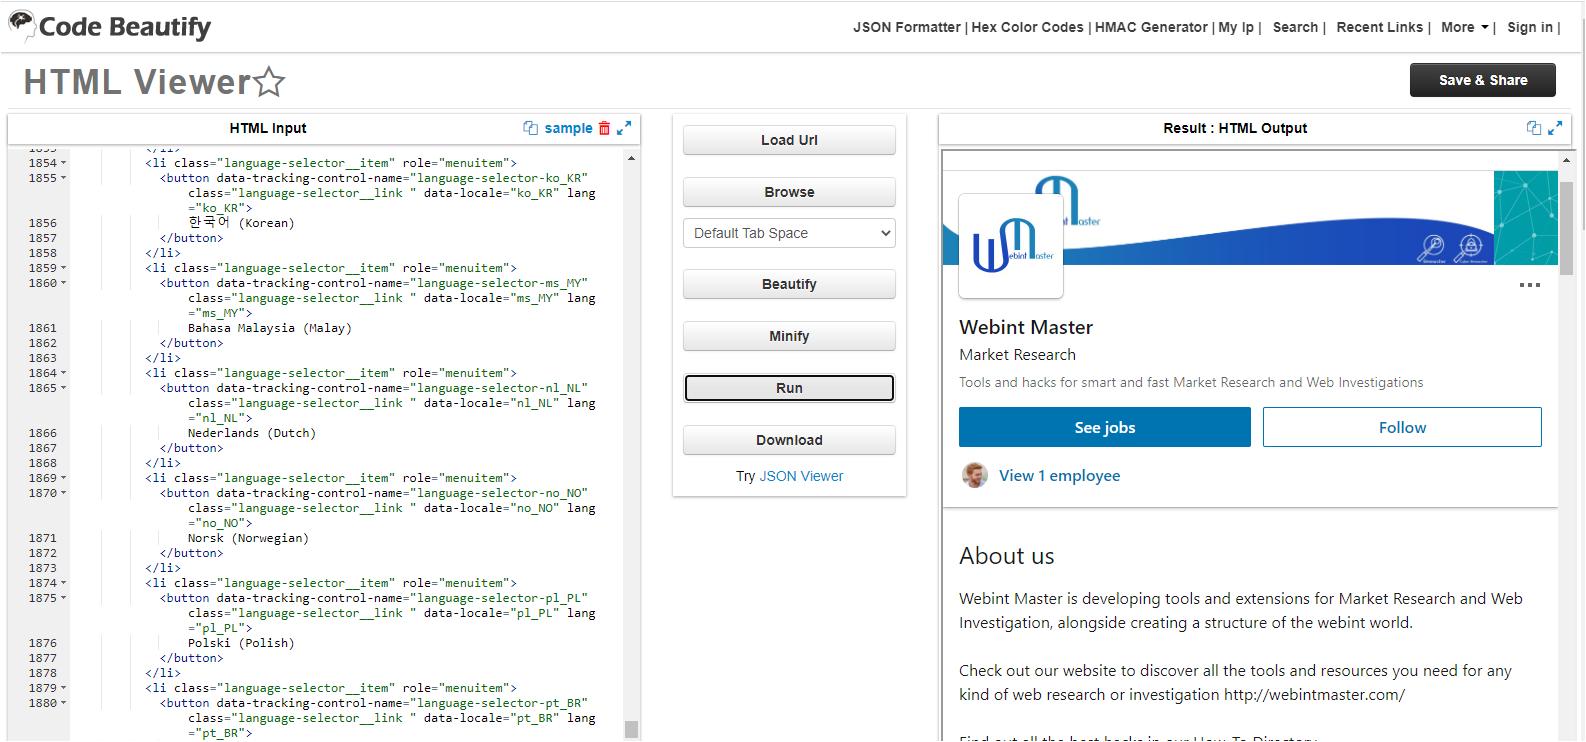 Code Beautify Tool, runs HTML file online